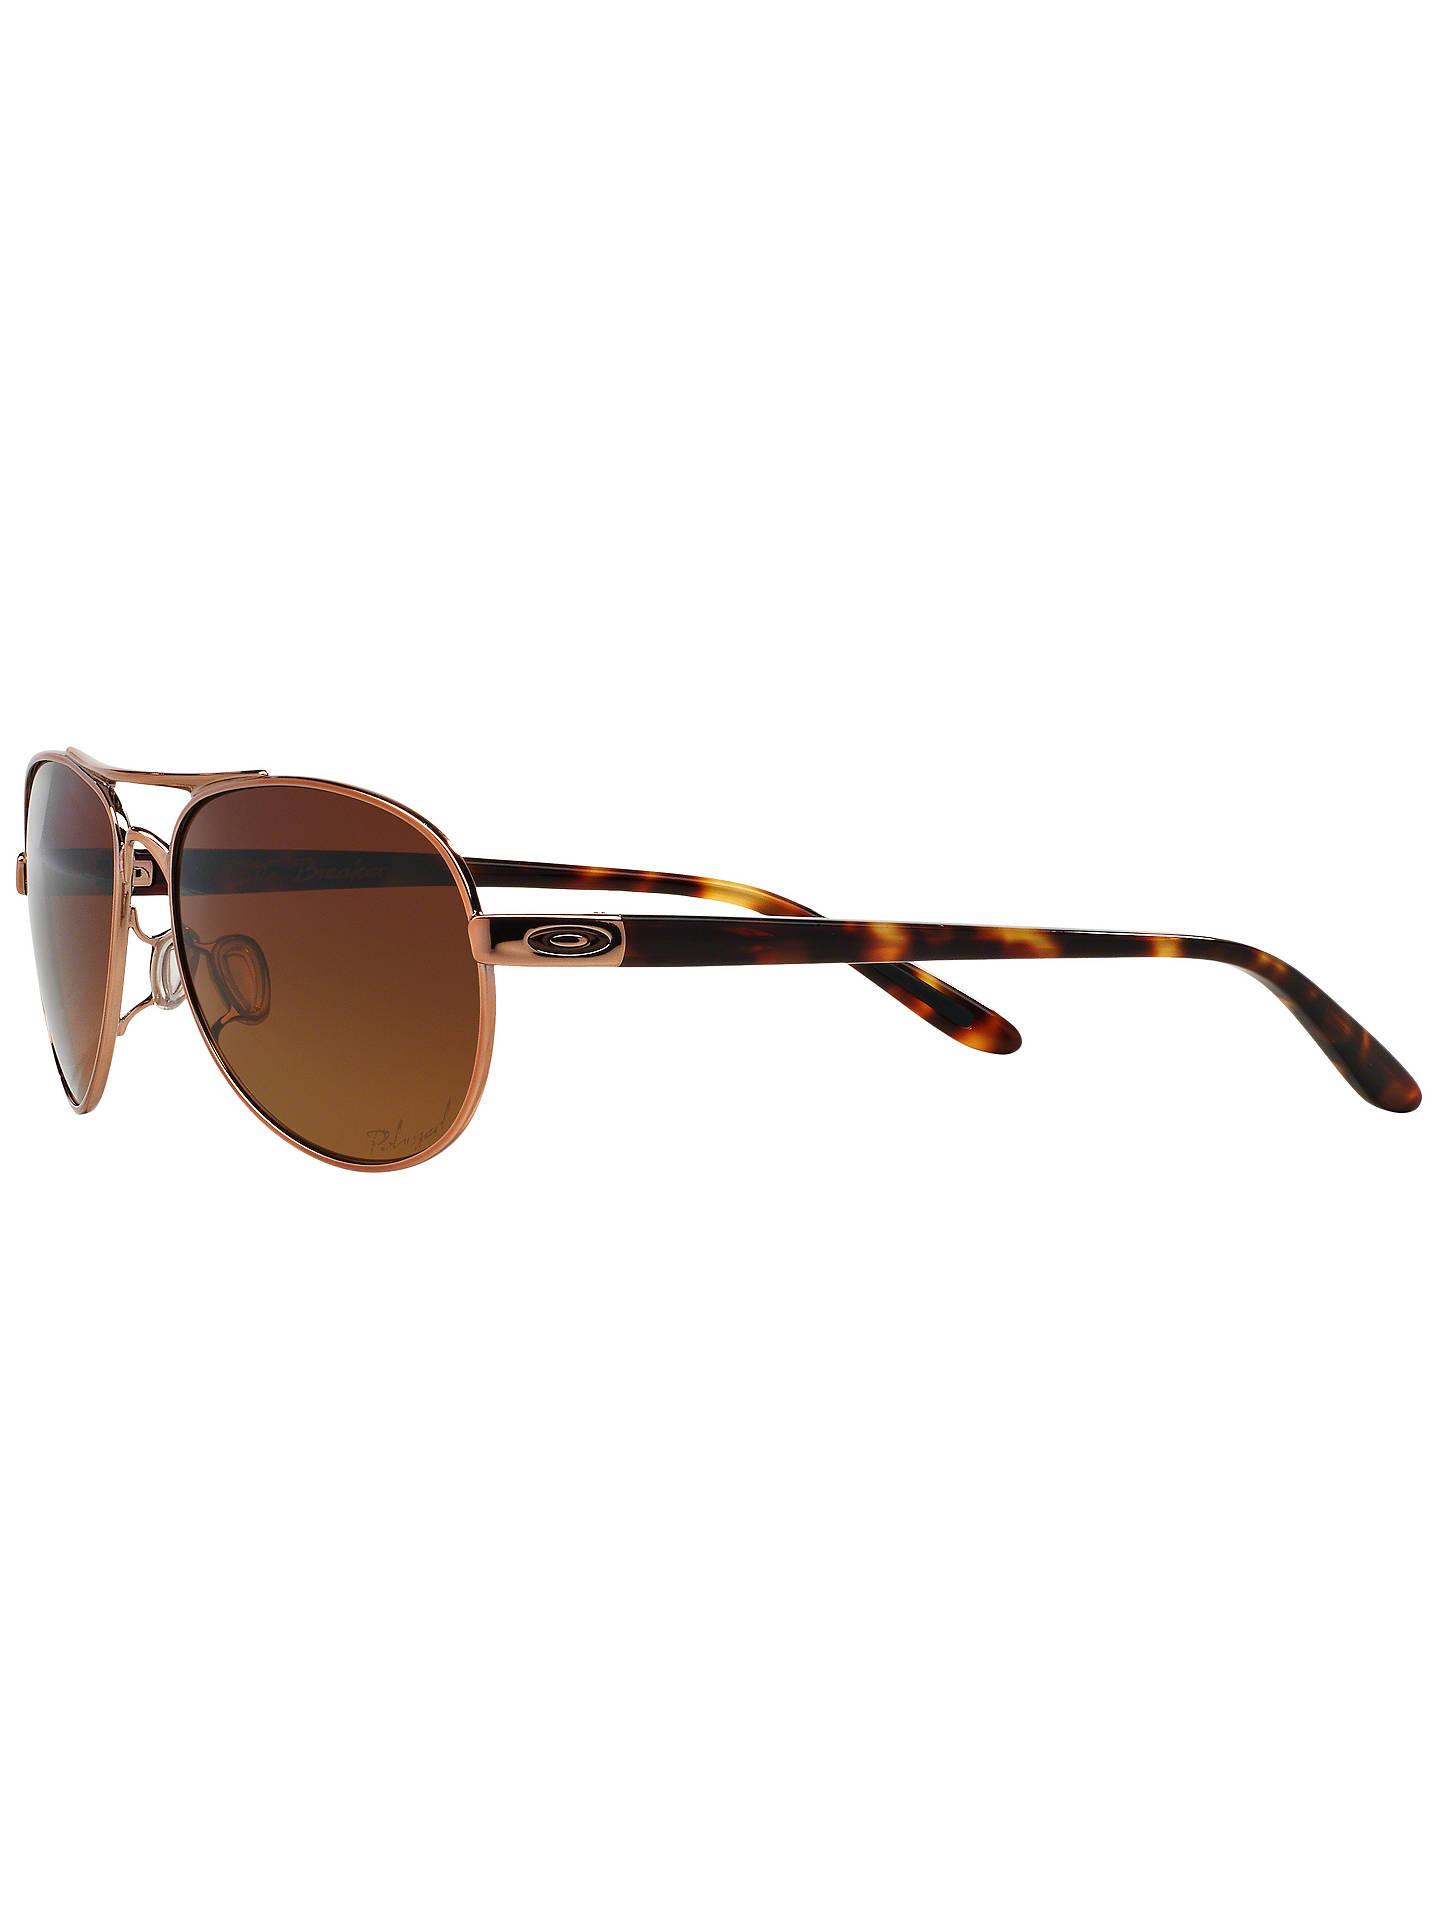 61c4b36d44 ... BuyOakley OO4108 Tie Breaker Polarised Sunglasses